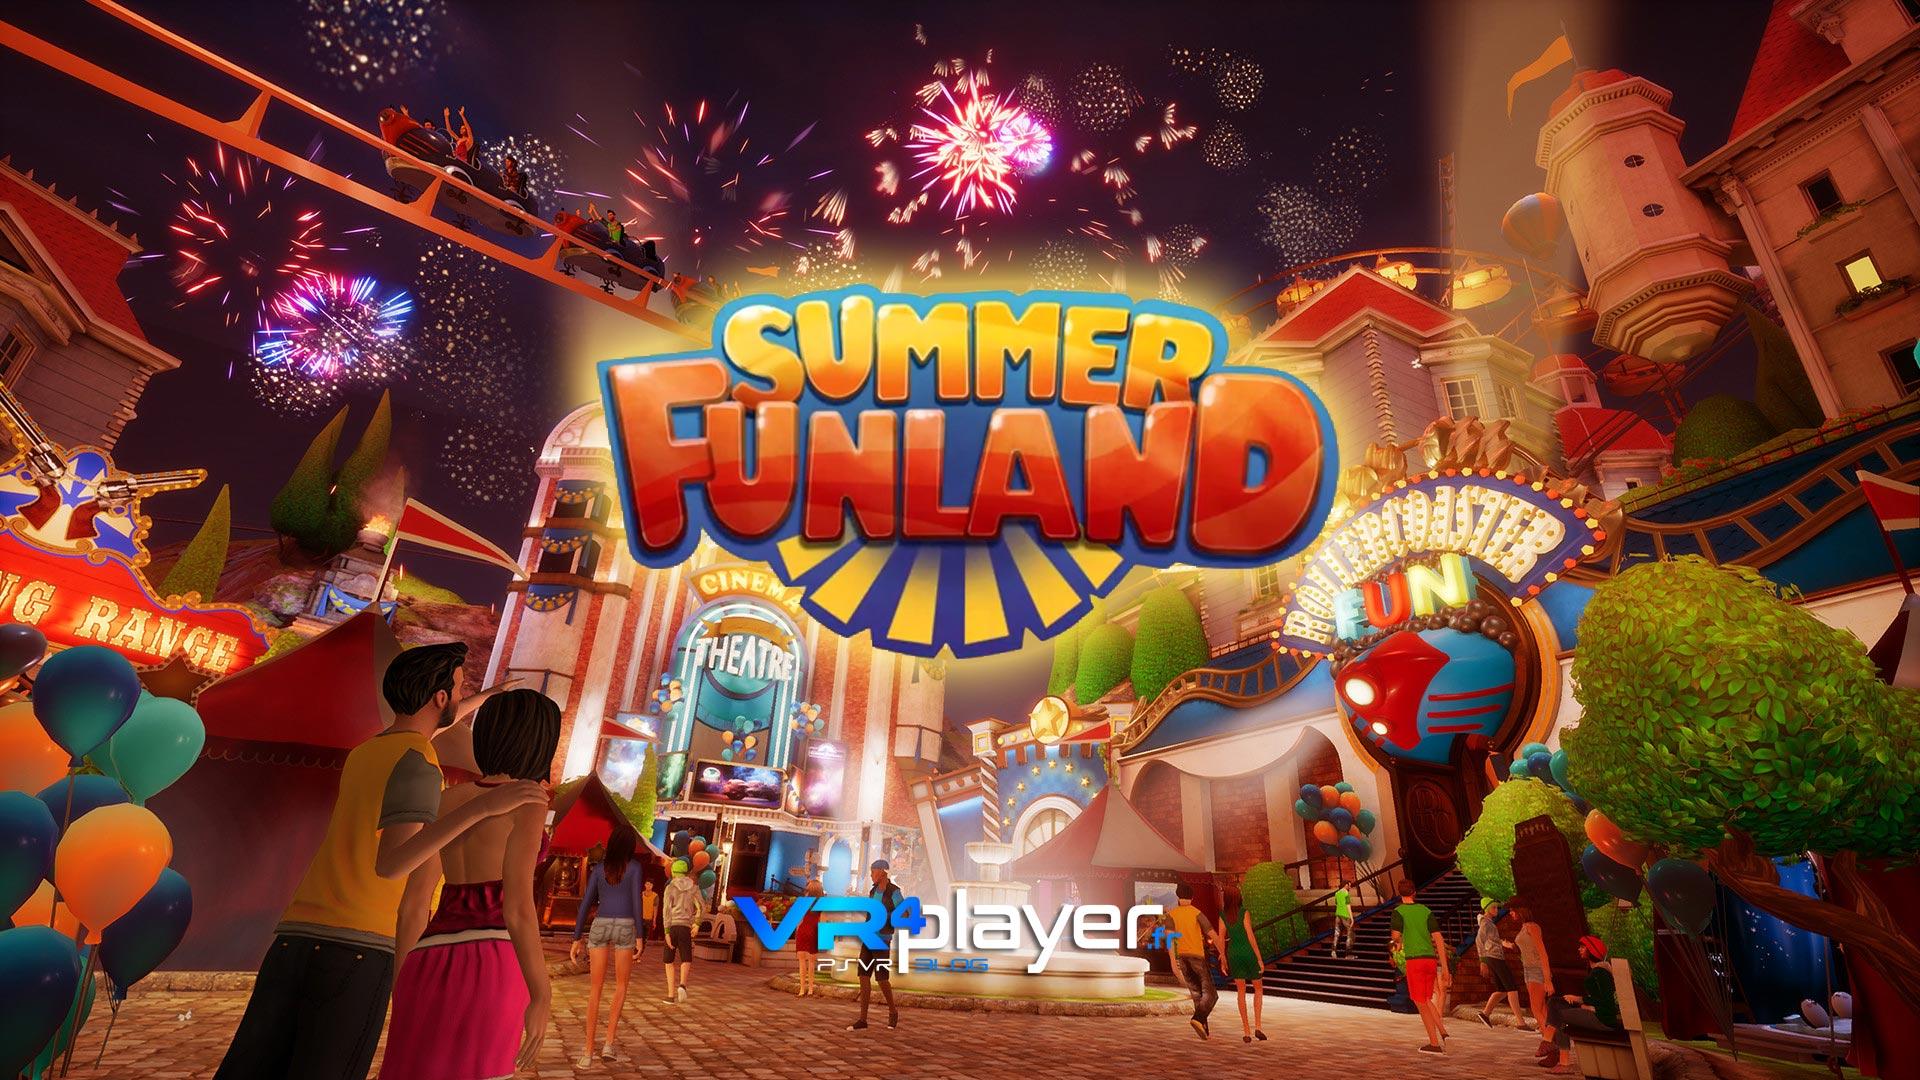 Summer Funland PSVR vrplayer.fr